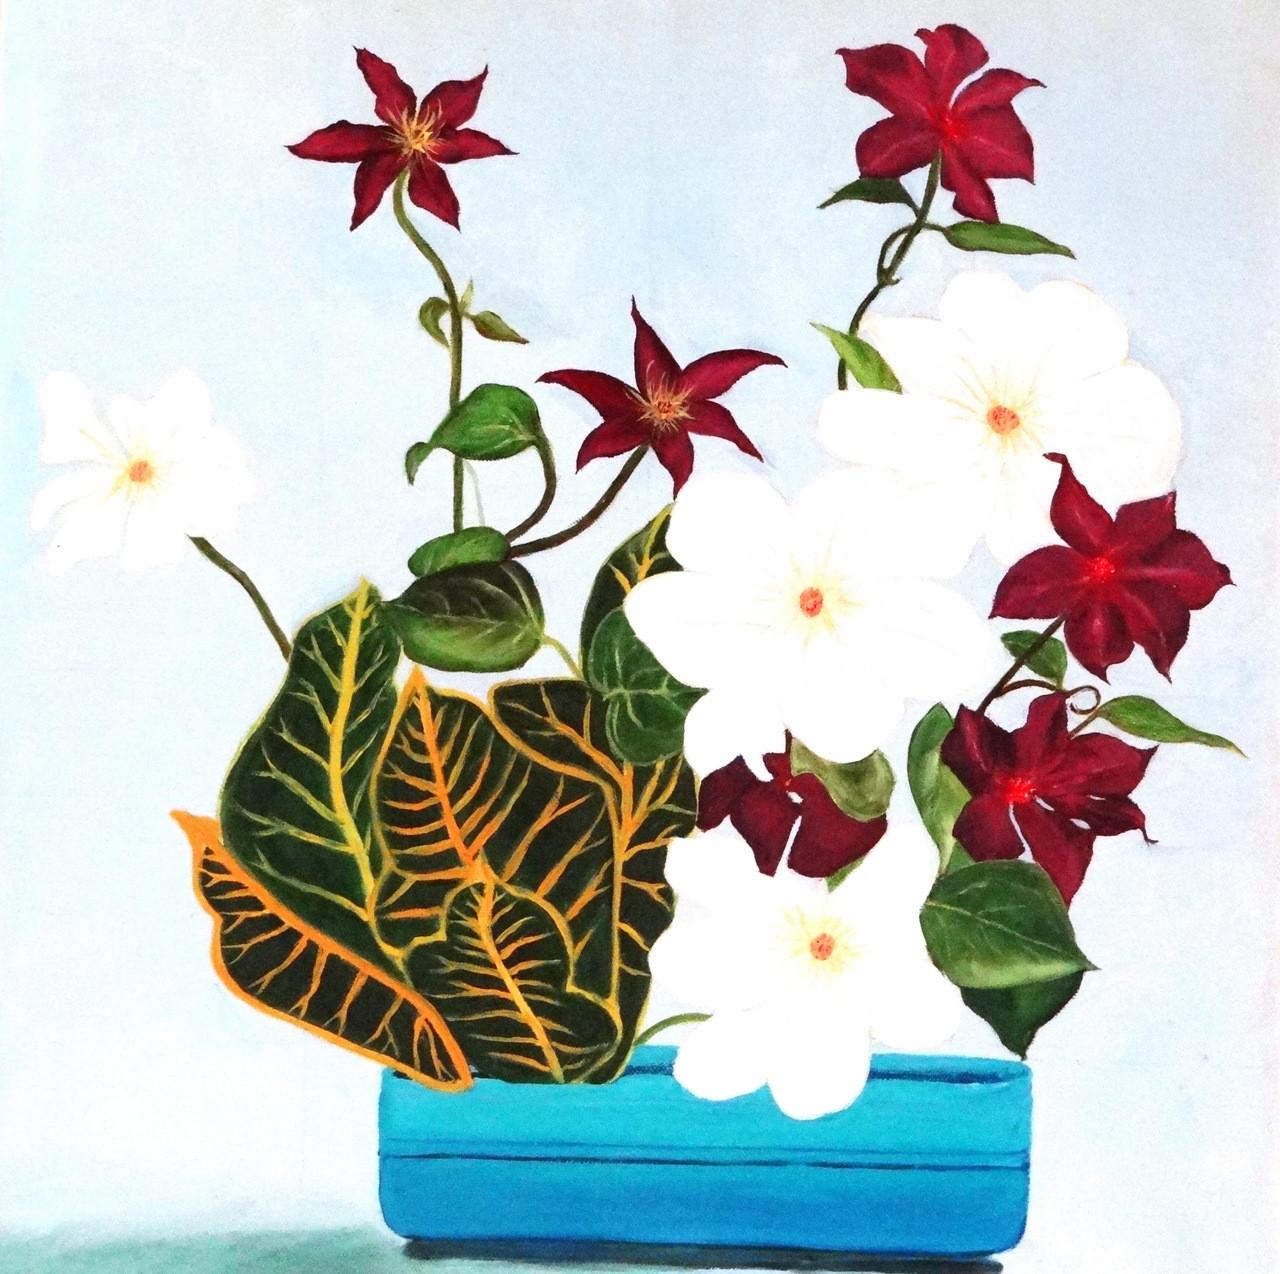 Buy White & Maroon Flowers Handmade Painting by Vineeta Sahi. Code ...